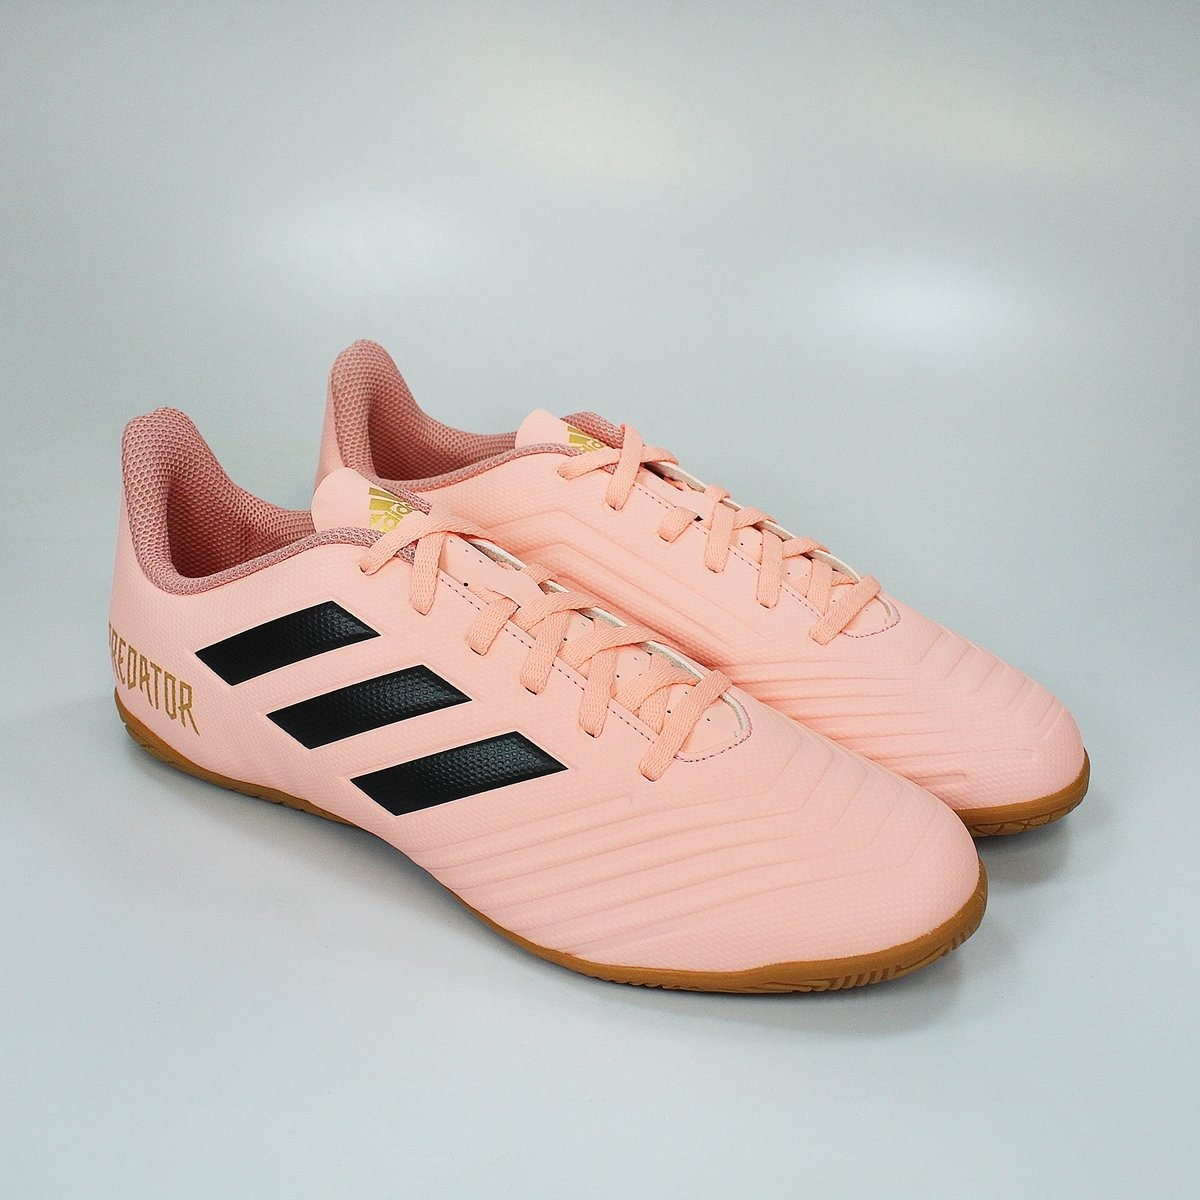 a171dd942 Chuteira Futsal adidas Predator 18 Tango 4